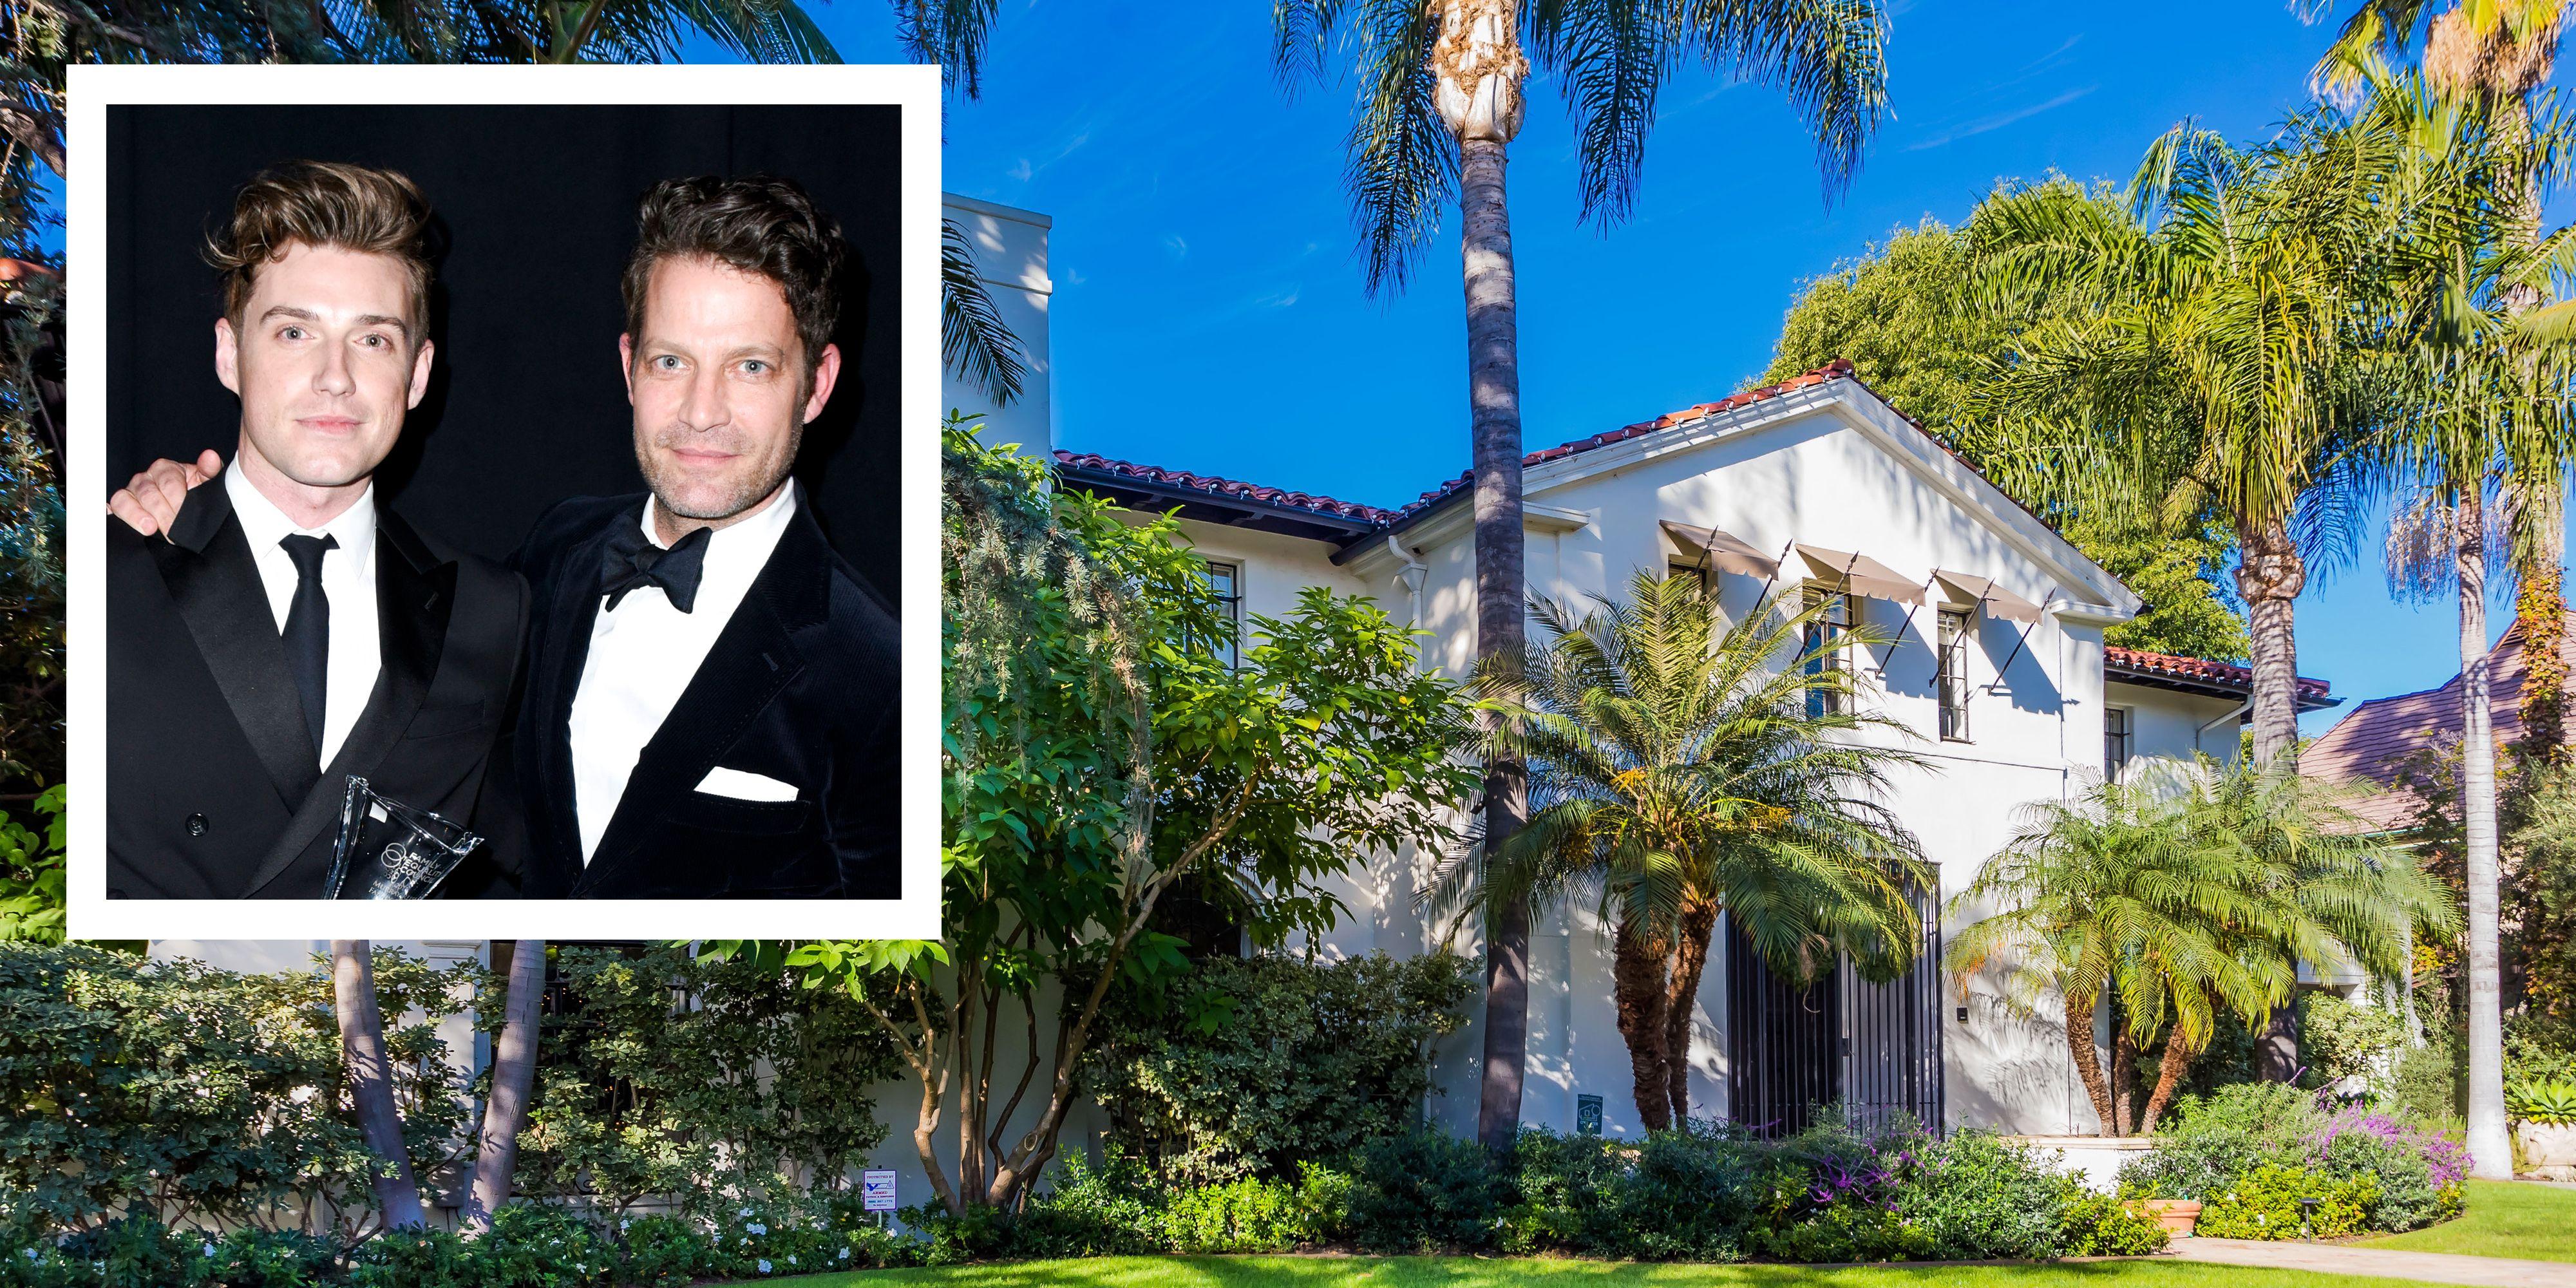 Celebrity Designers Nate Berkus and Jeremiah Brent List Historic LA Home for $13.8 Million